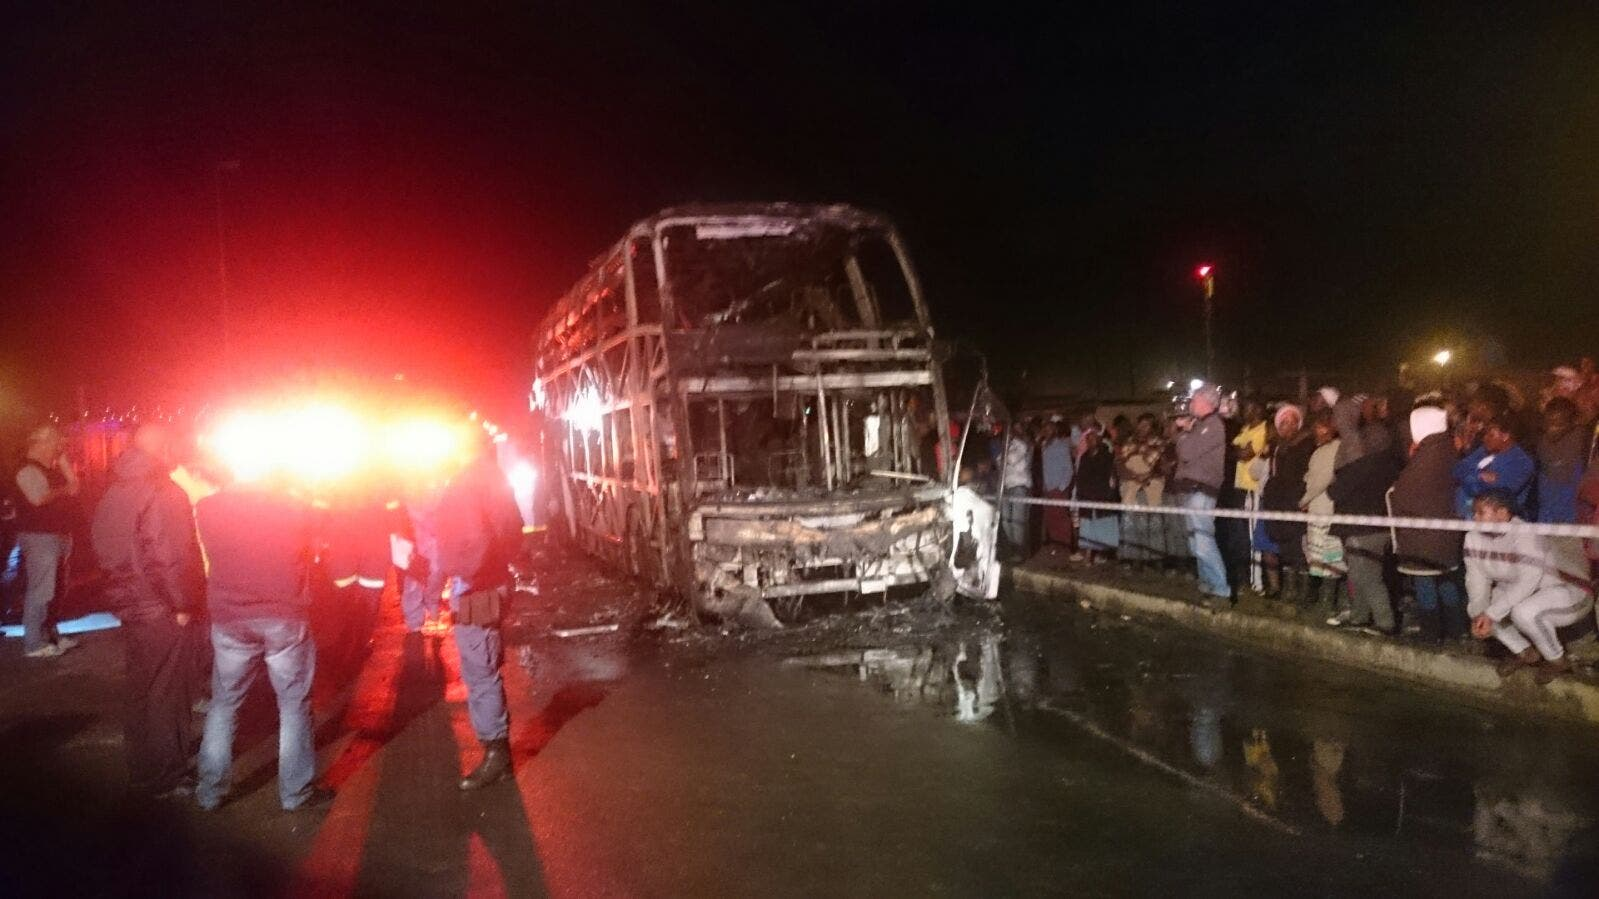 Burning bus, Strand